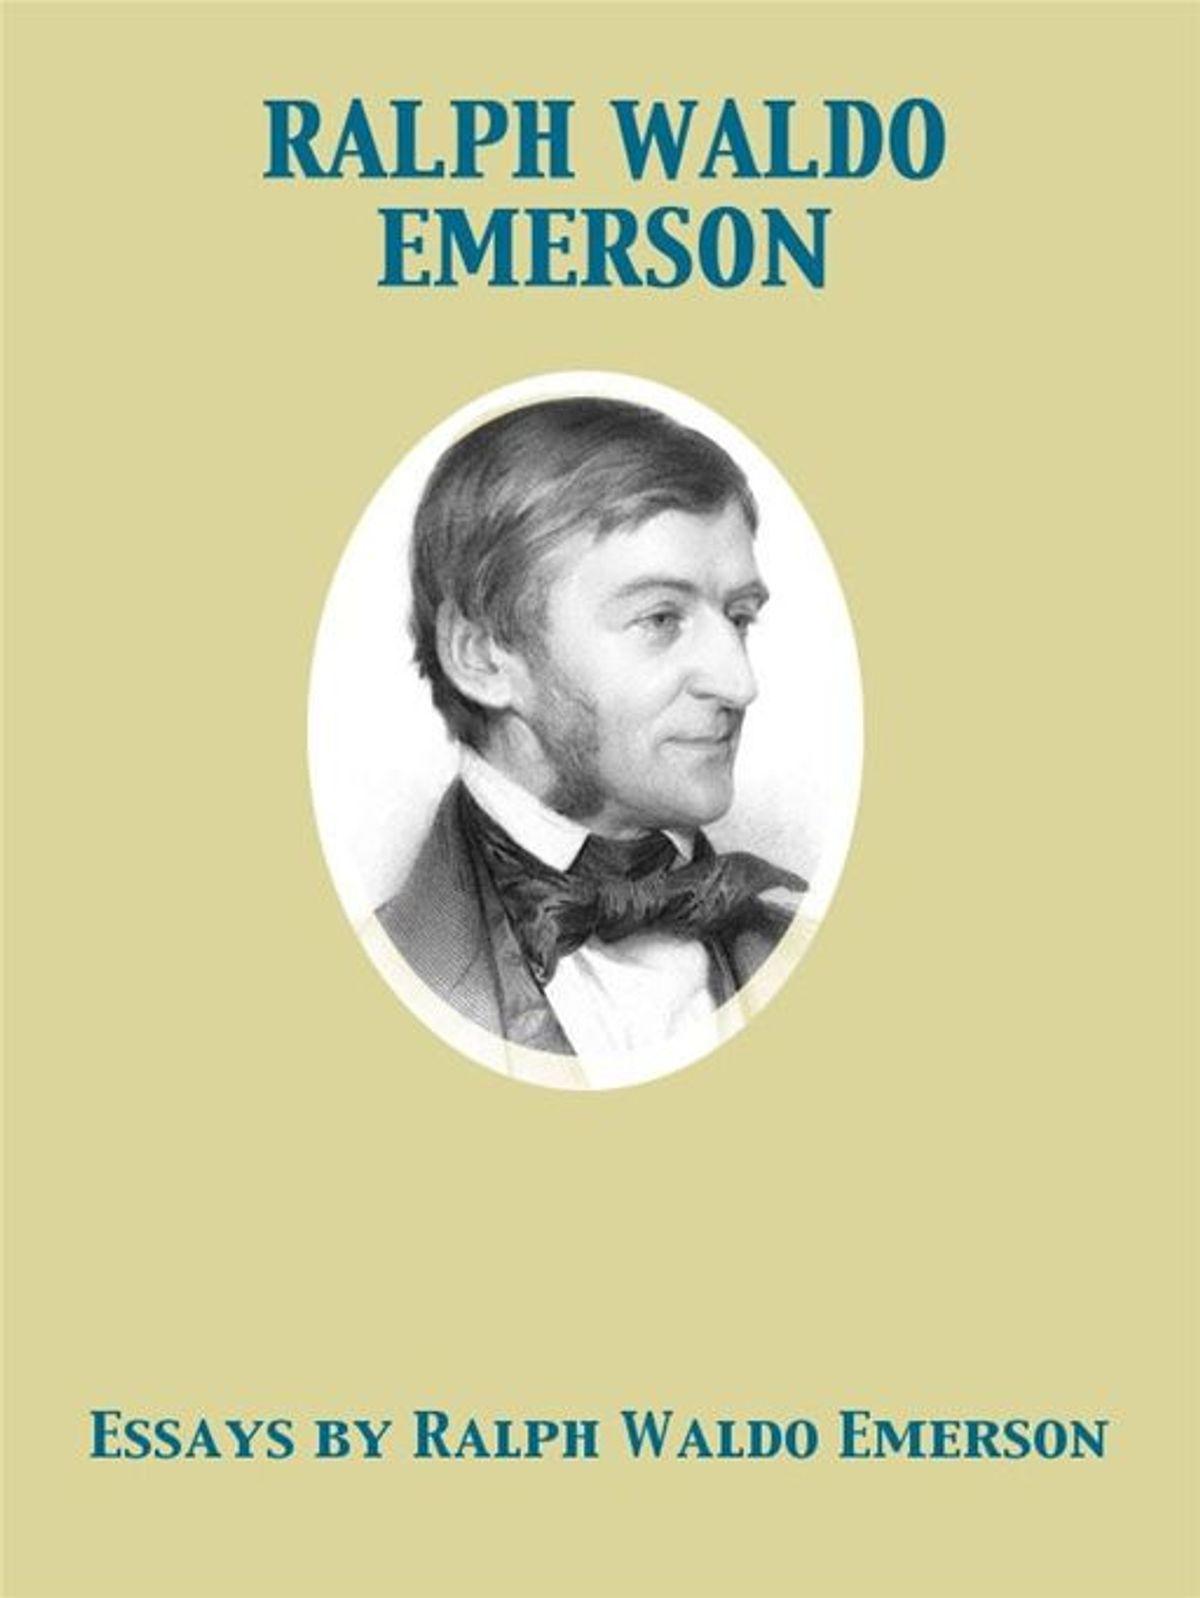 008 Emerson Essays By Ralph Waldo Essay Dreaded Pdf First Series Summary Nature Full